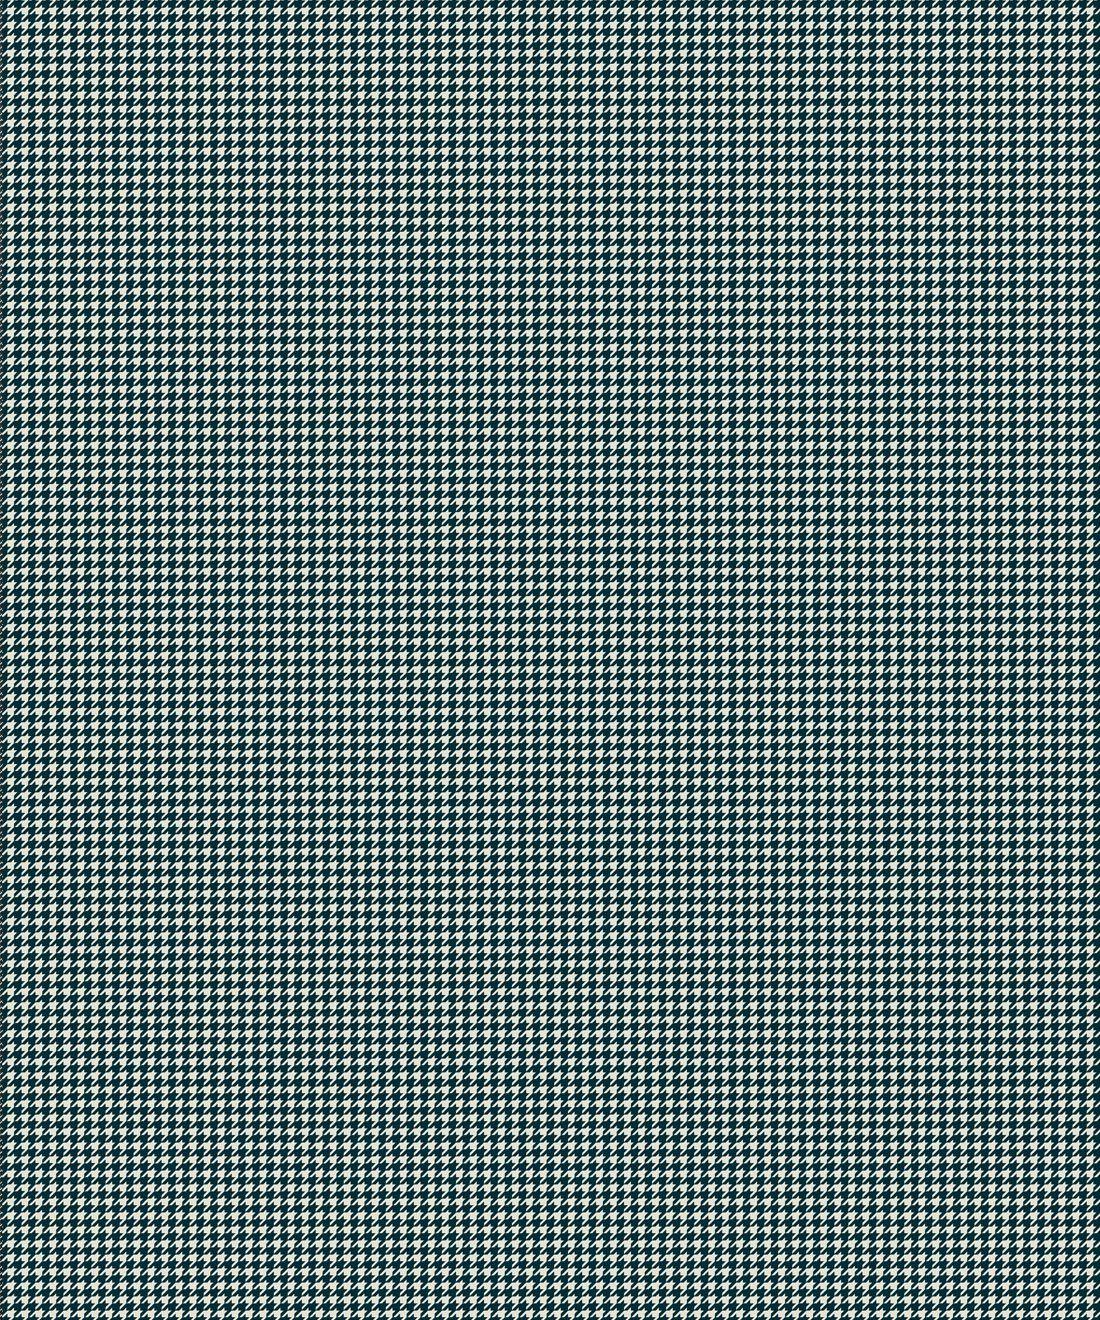 Houndstooth Wallpaper • Dogstooth Wallpaper • Dark Green •Swatch